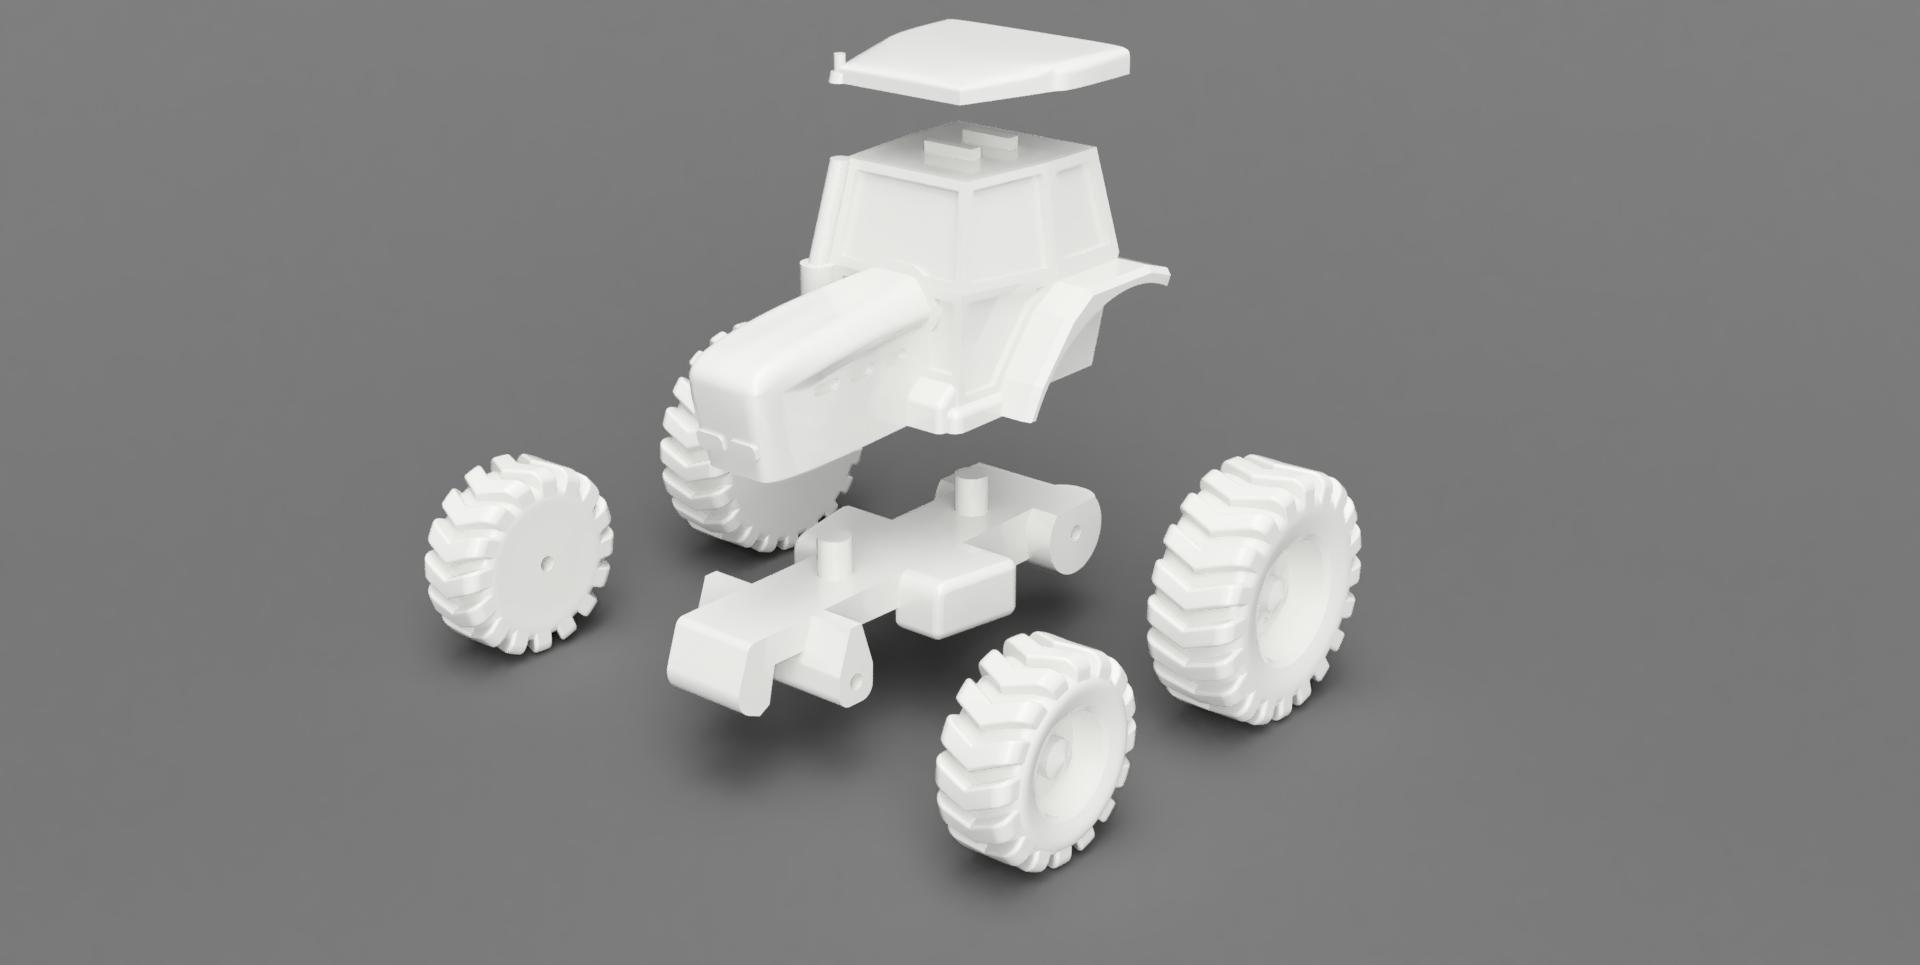 Renders 2.jpg Download free STL file Easy to print Generic Tractor (esc: 1: 100) • 3D printing template, guaro3d